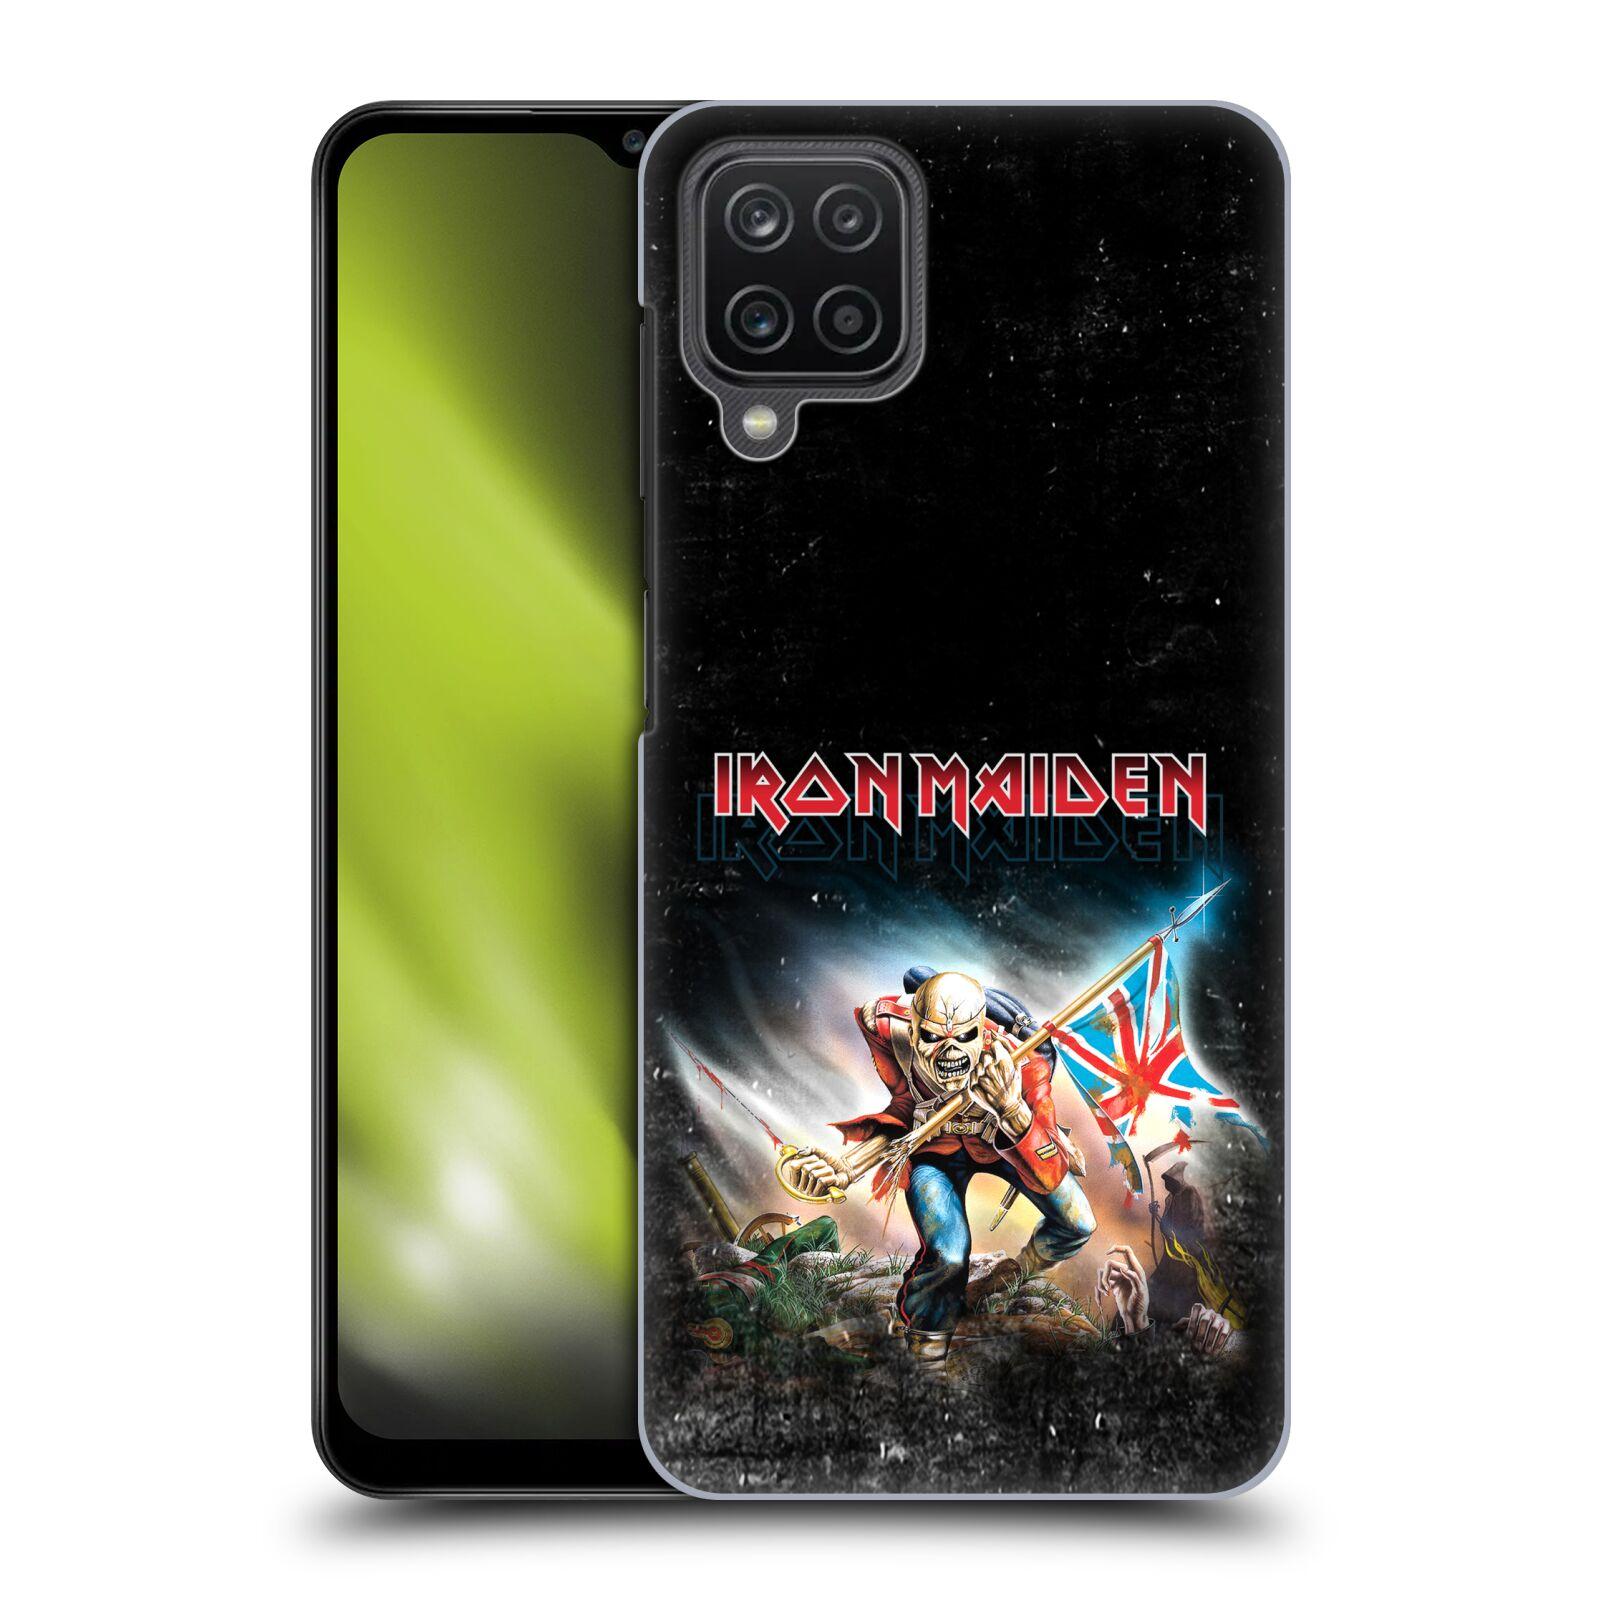 Plastové pouzdro na mobil Samsung Galaxy A12 - Head Case - Iron Maiden - Trooper 2016